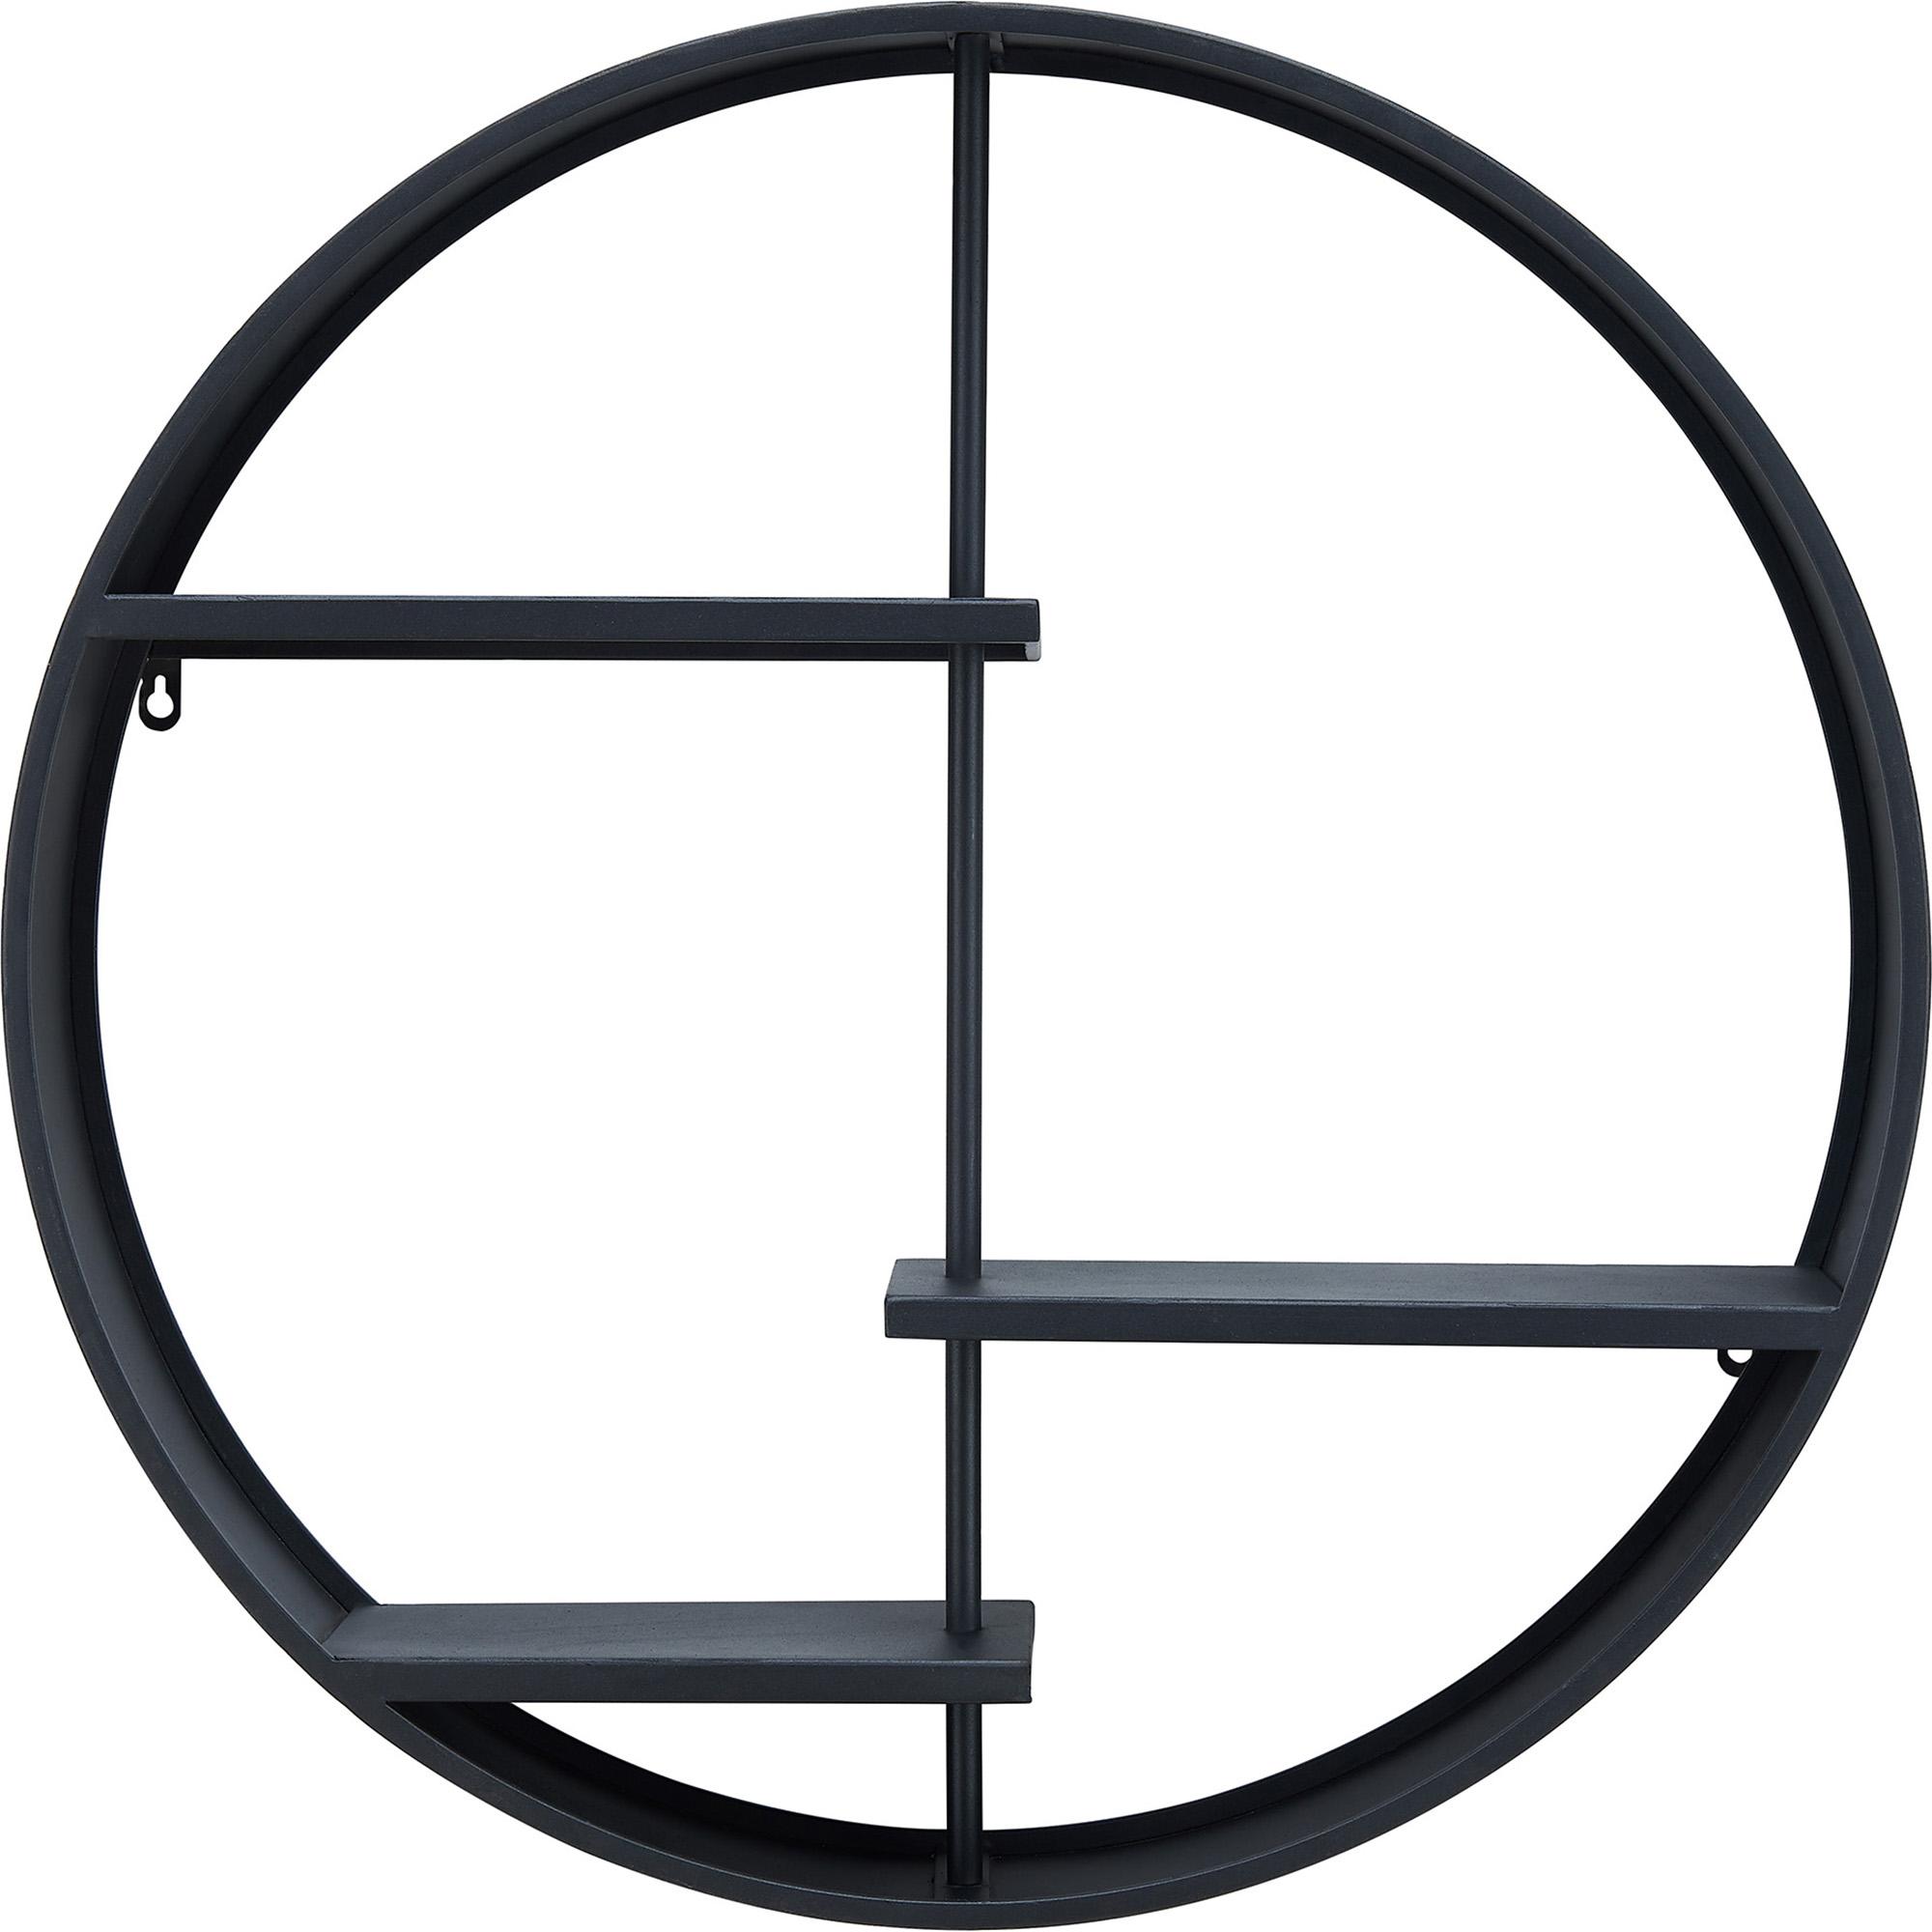 FirsTime & Co.® Brock Industrial Circular Shelf, American Crafted, Dark Gray, 27 x 6 x 27 in, (70195) $60.68